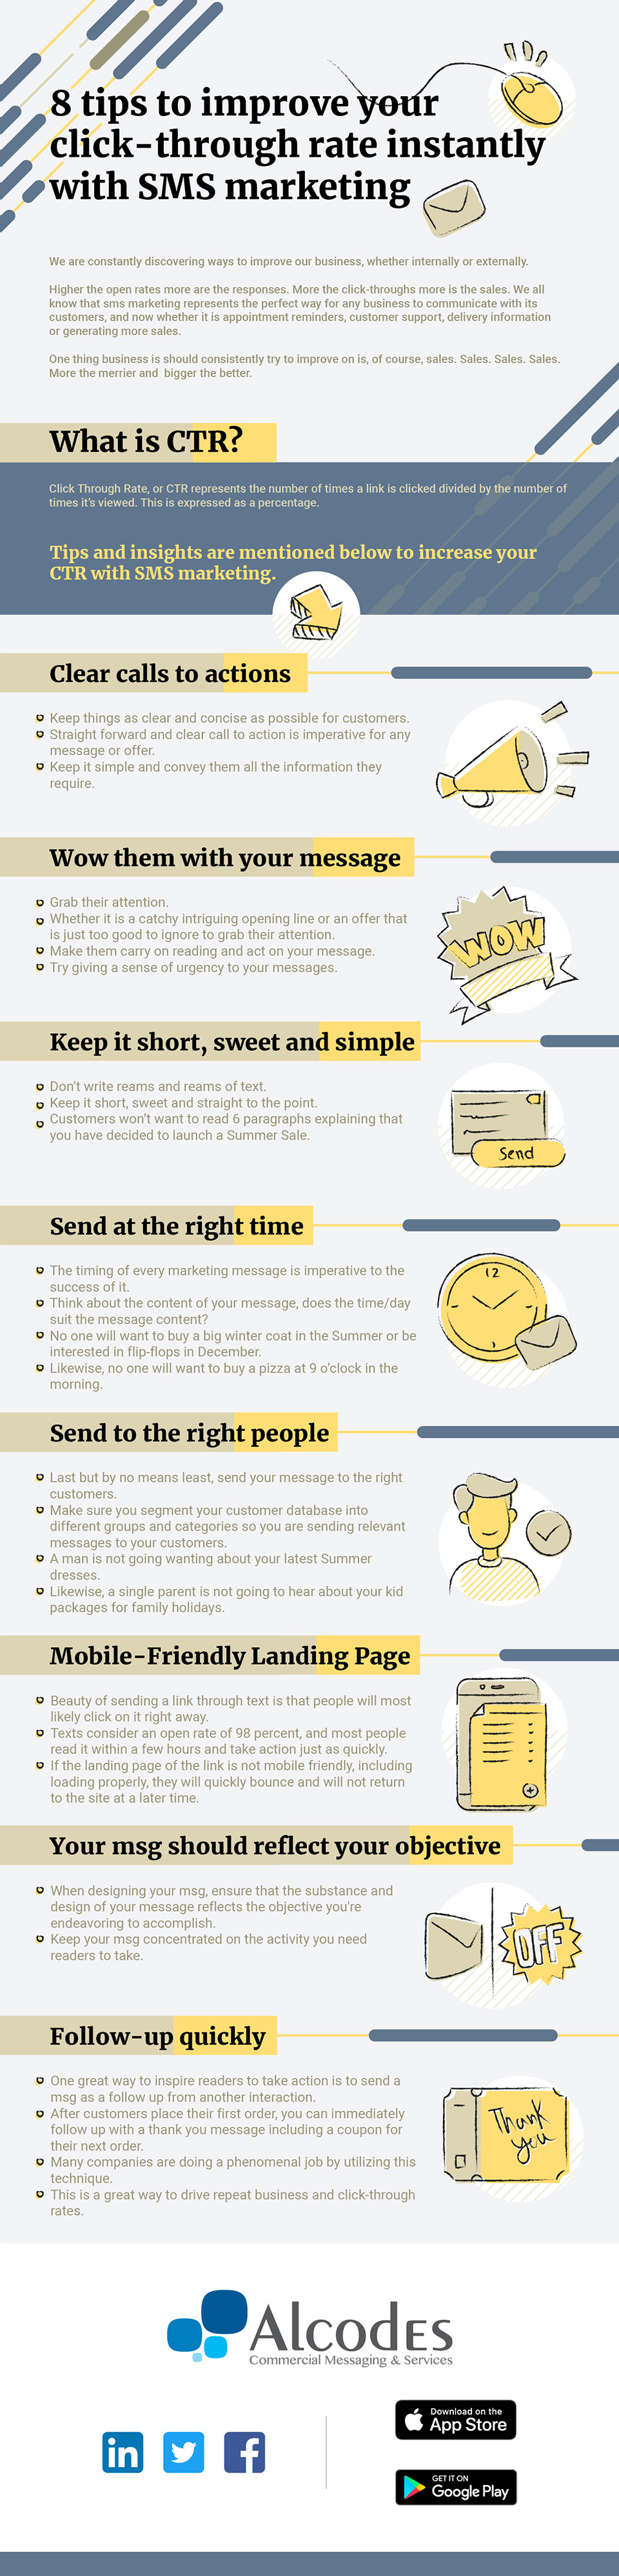 Quick Ways to Improve Click-Through Rate